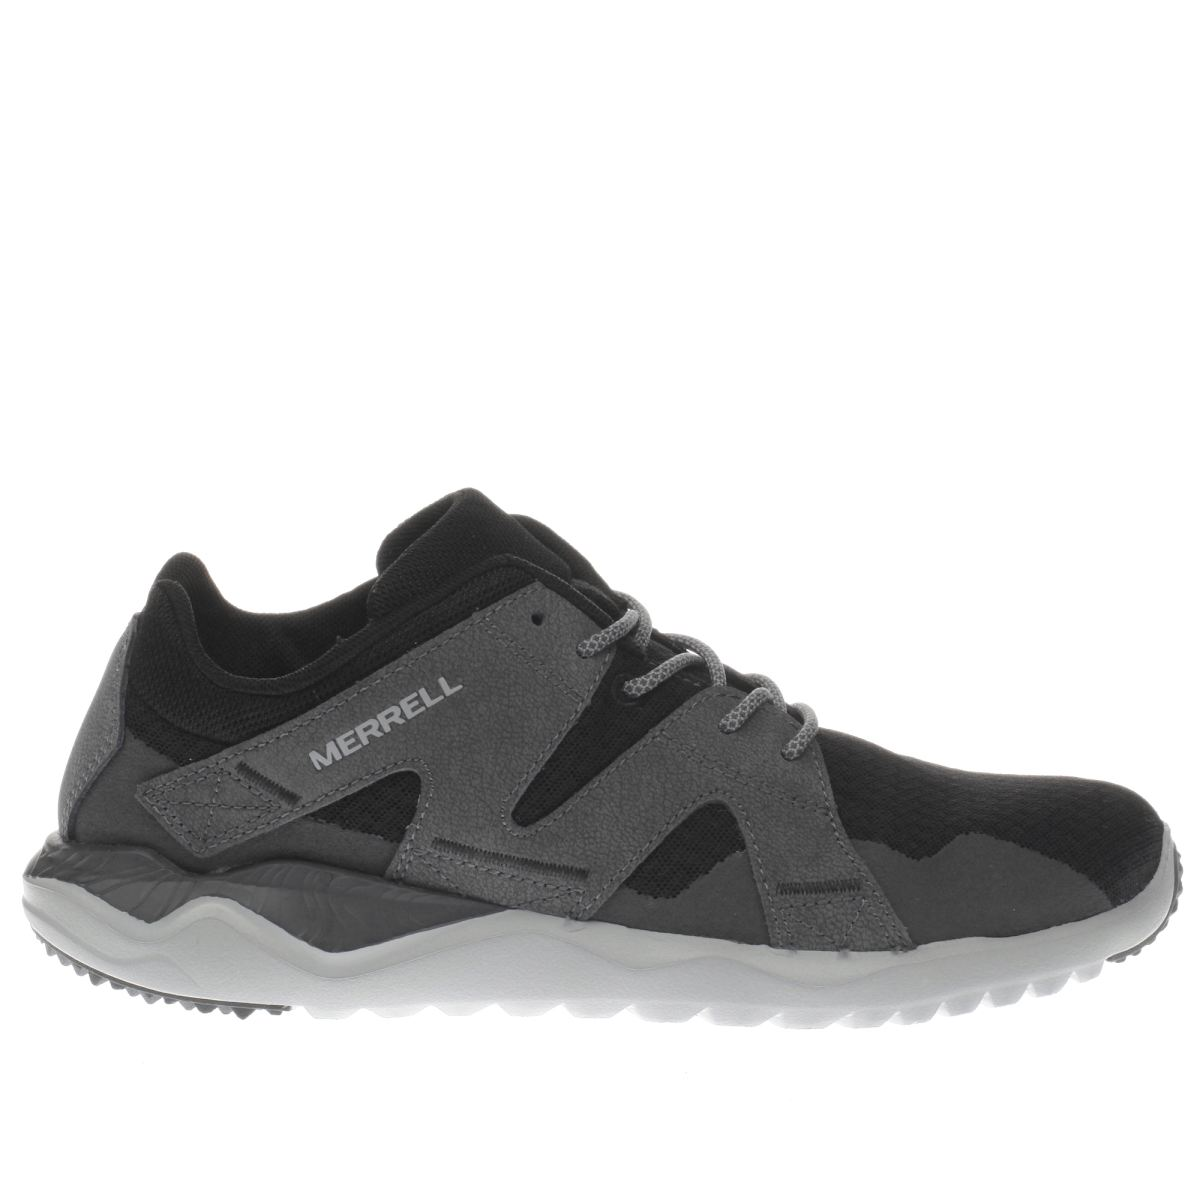 merrell grey & black 1six8 trainers